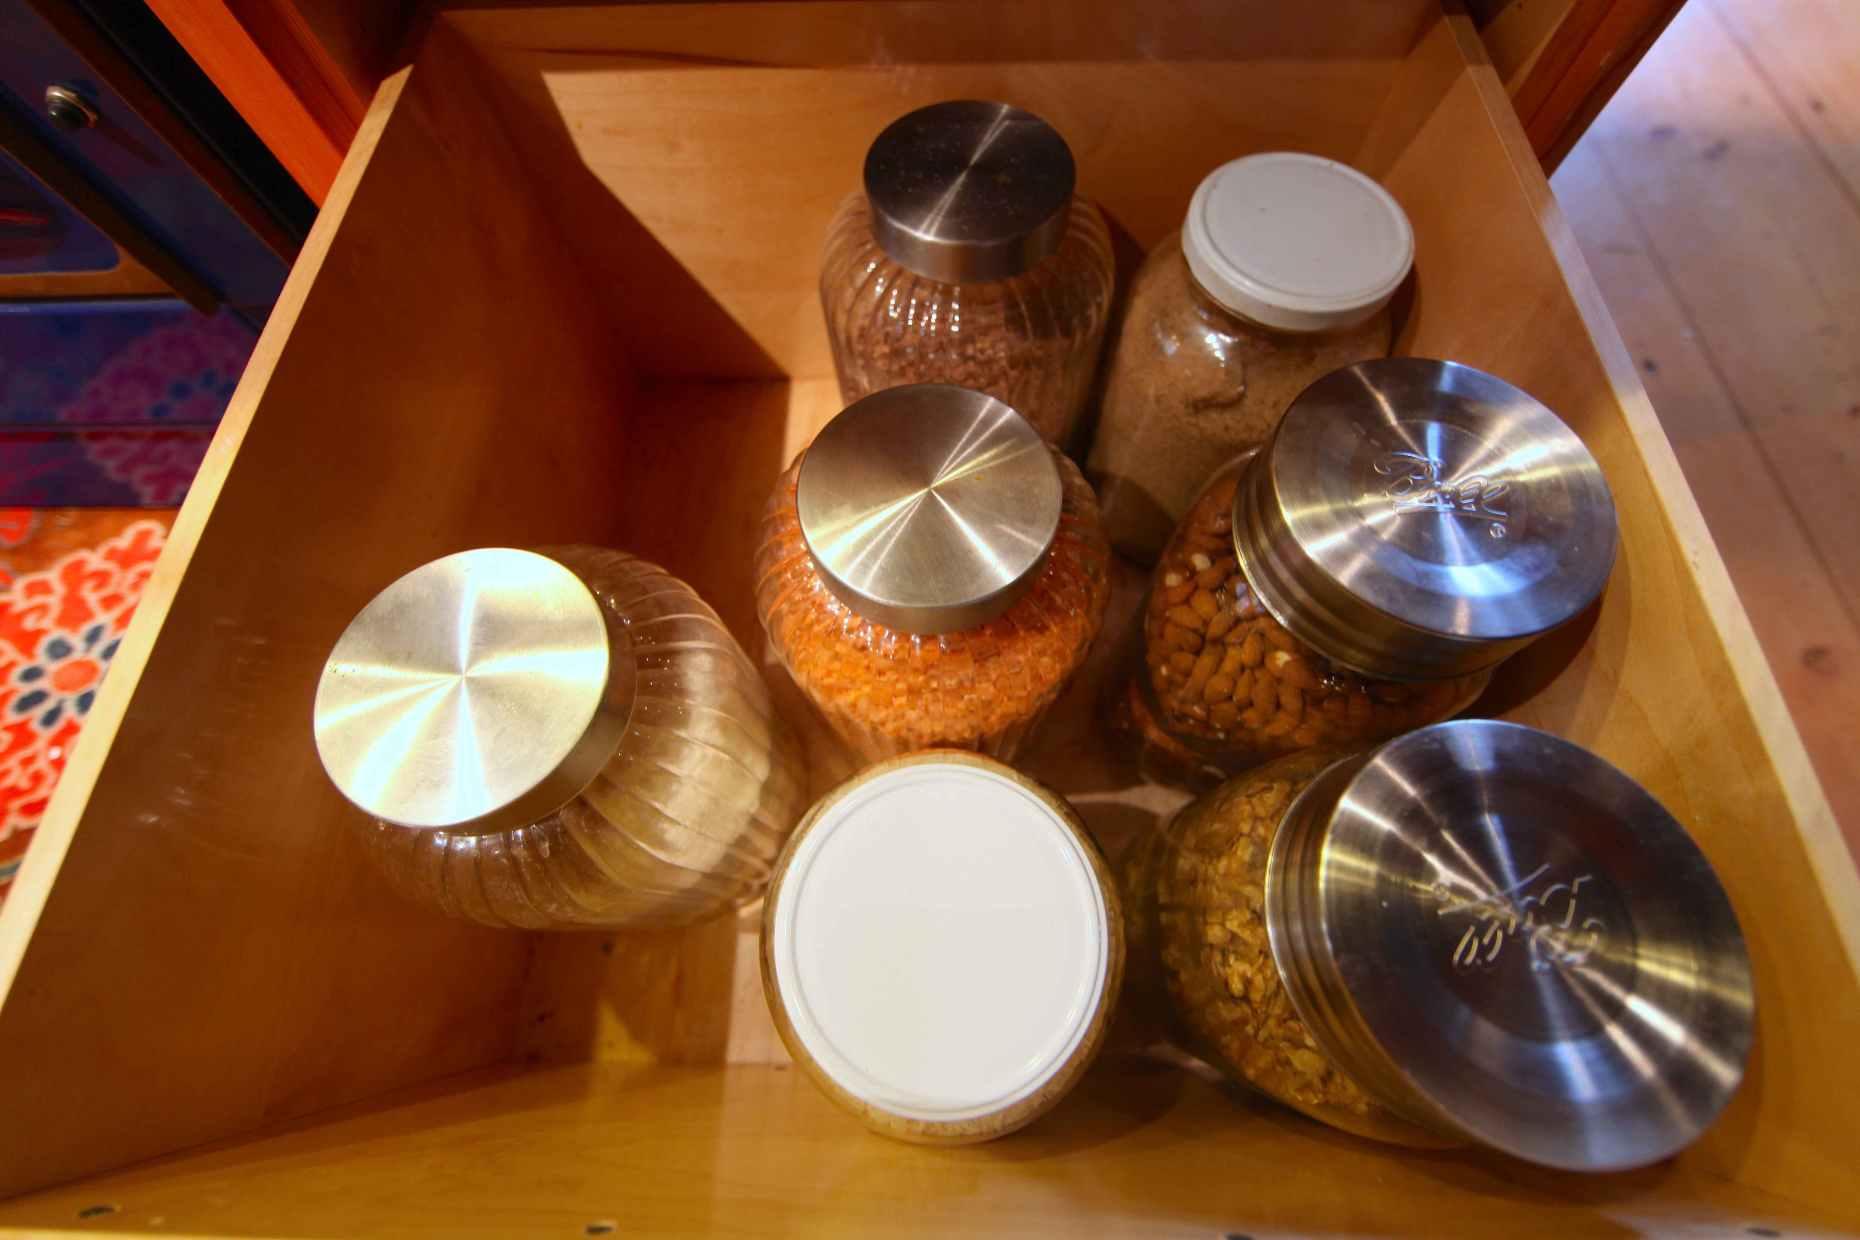 Storage Jars for Sugar, Nuts, and Grains. Photo © Liesl Clark